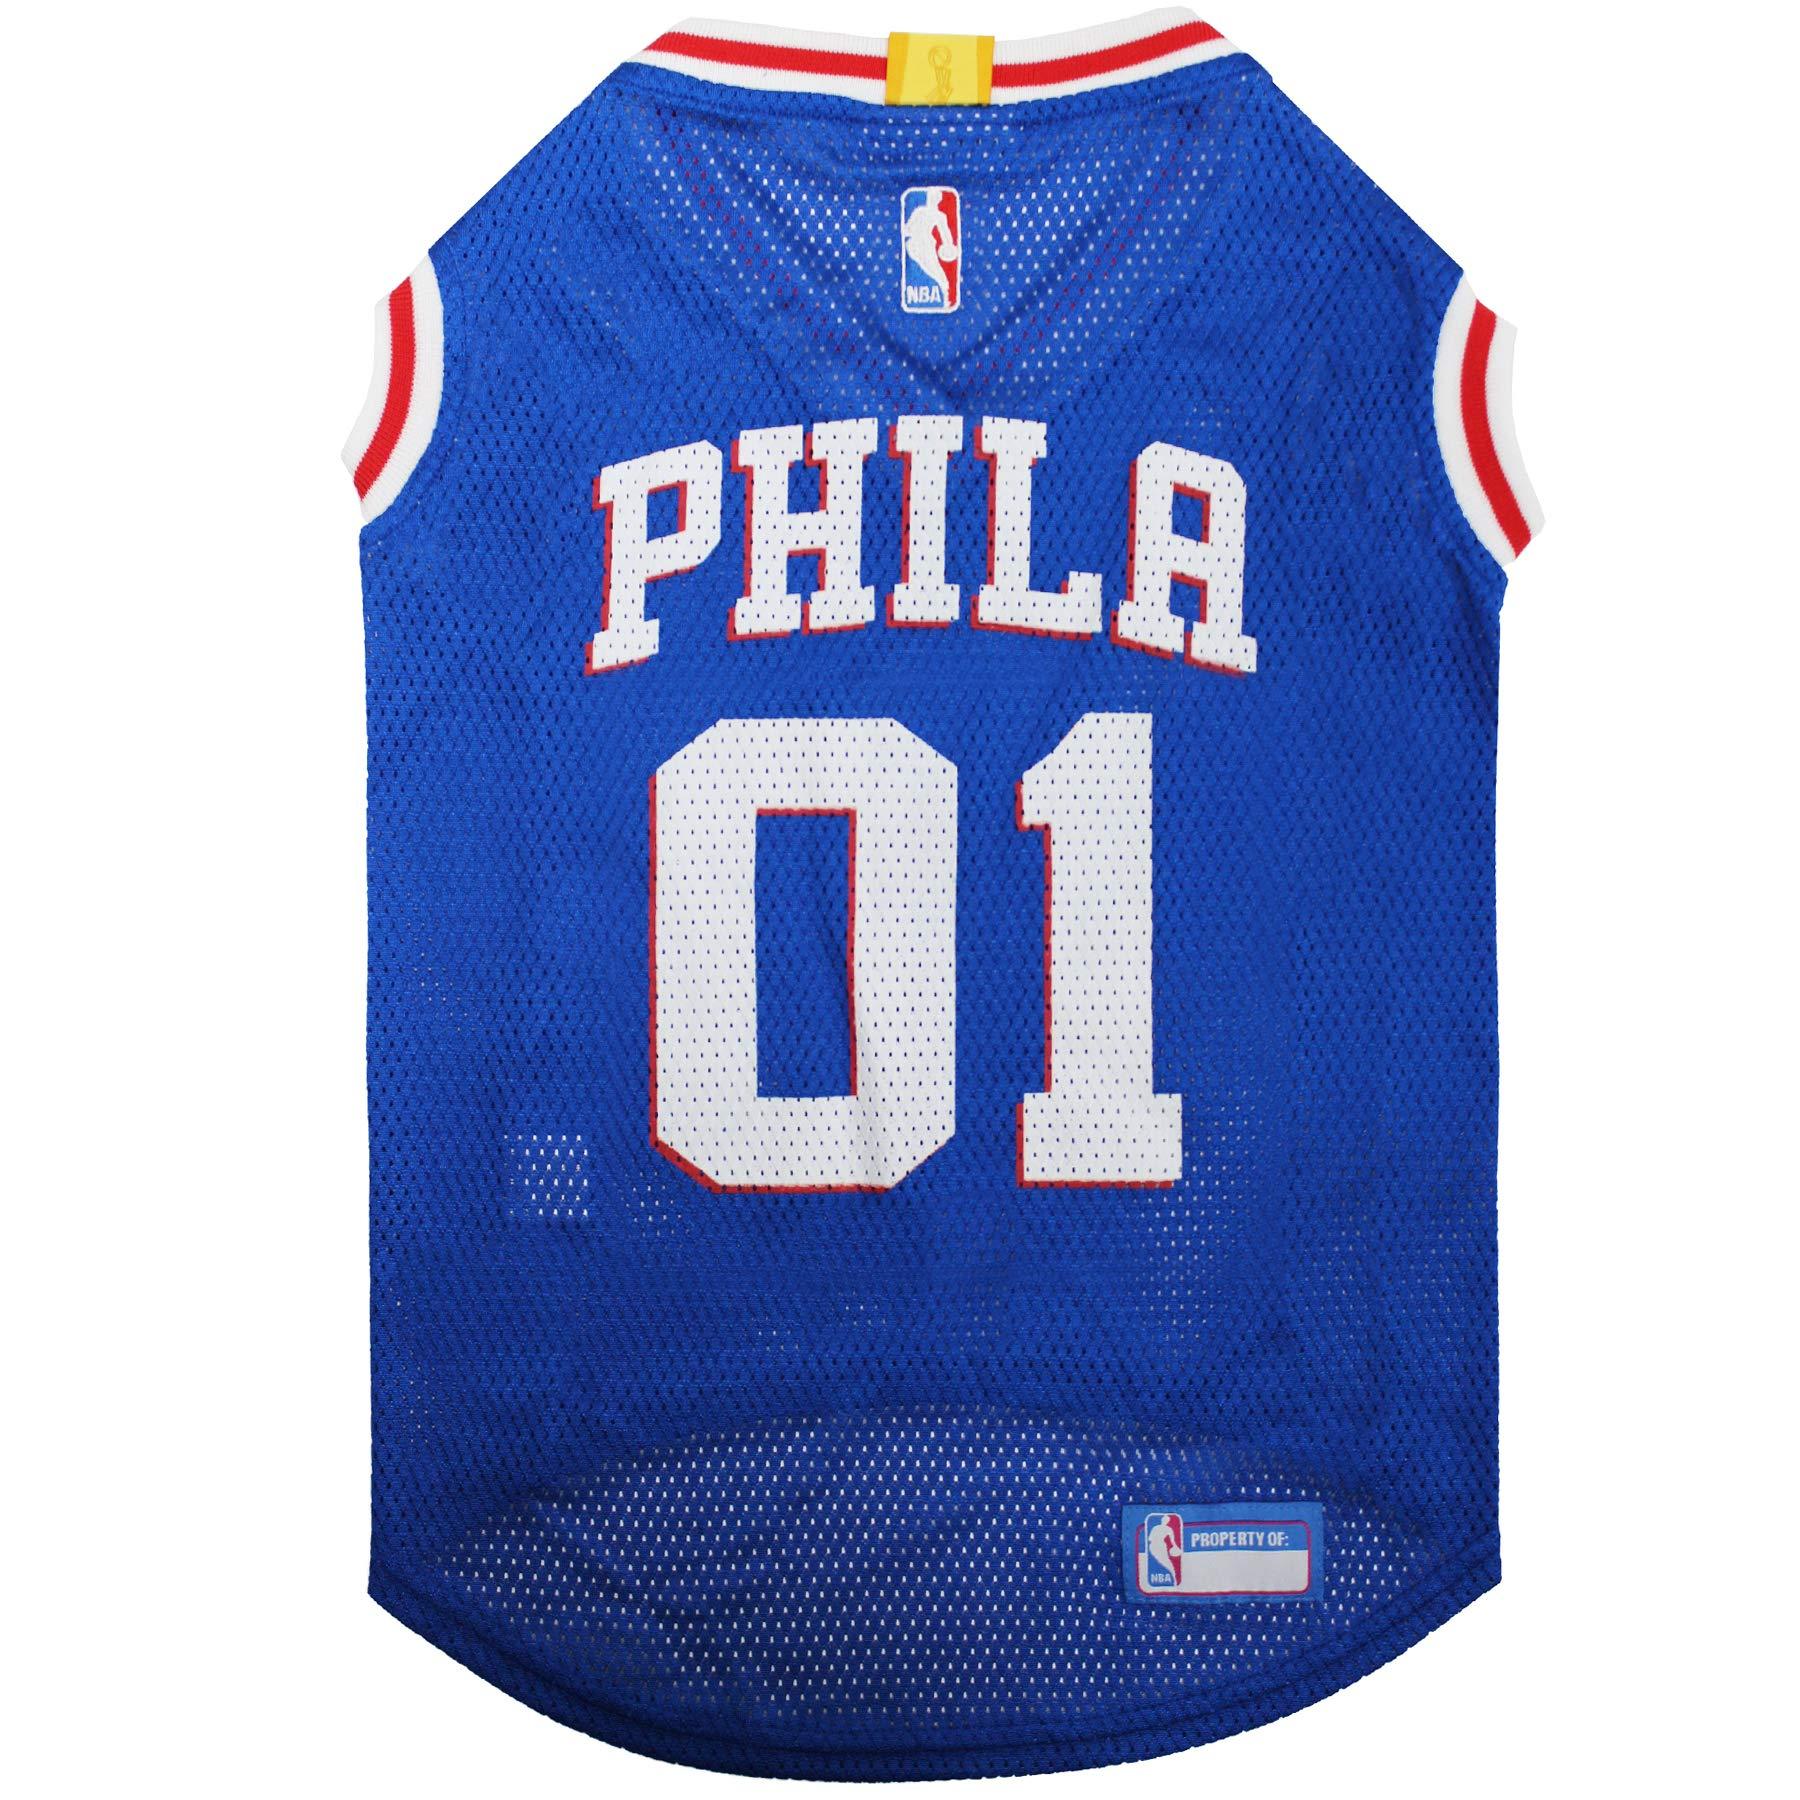 NBA PHILADELPHIA 76ERS DOG Jersey, X-Large - Tank Top Basketball Pet Jersey